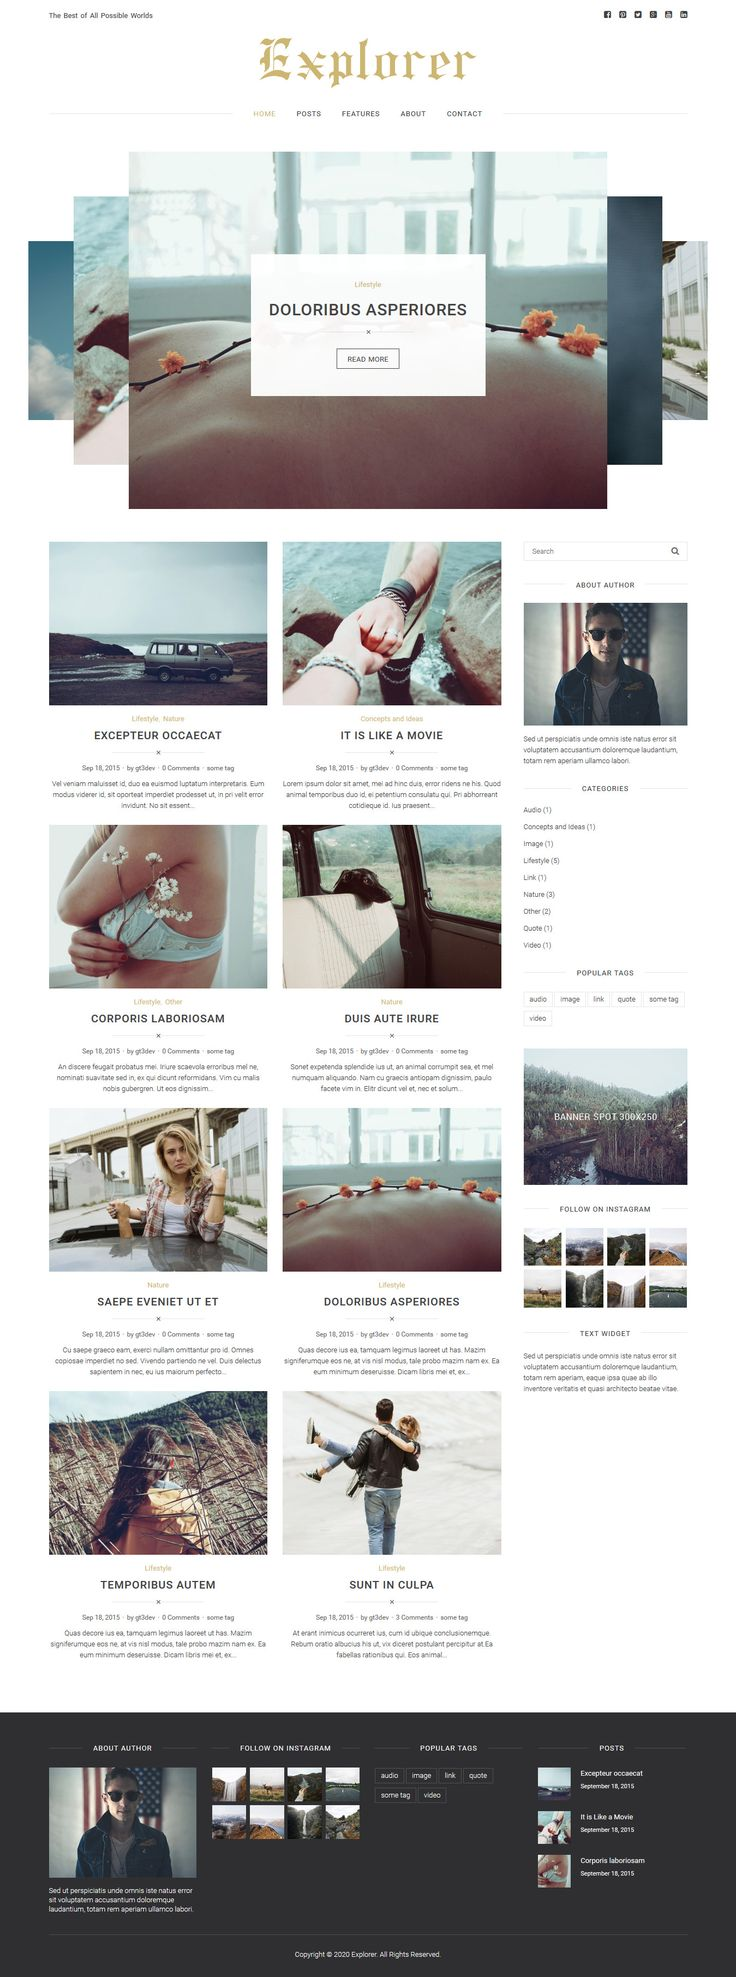 Explorer - Personal WordPress Blog Theme #blogging #blogtemplate Download: http://themeforest.net/item/explorer-personal-wordpress-blog-theme/13066135?ref=ksioks